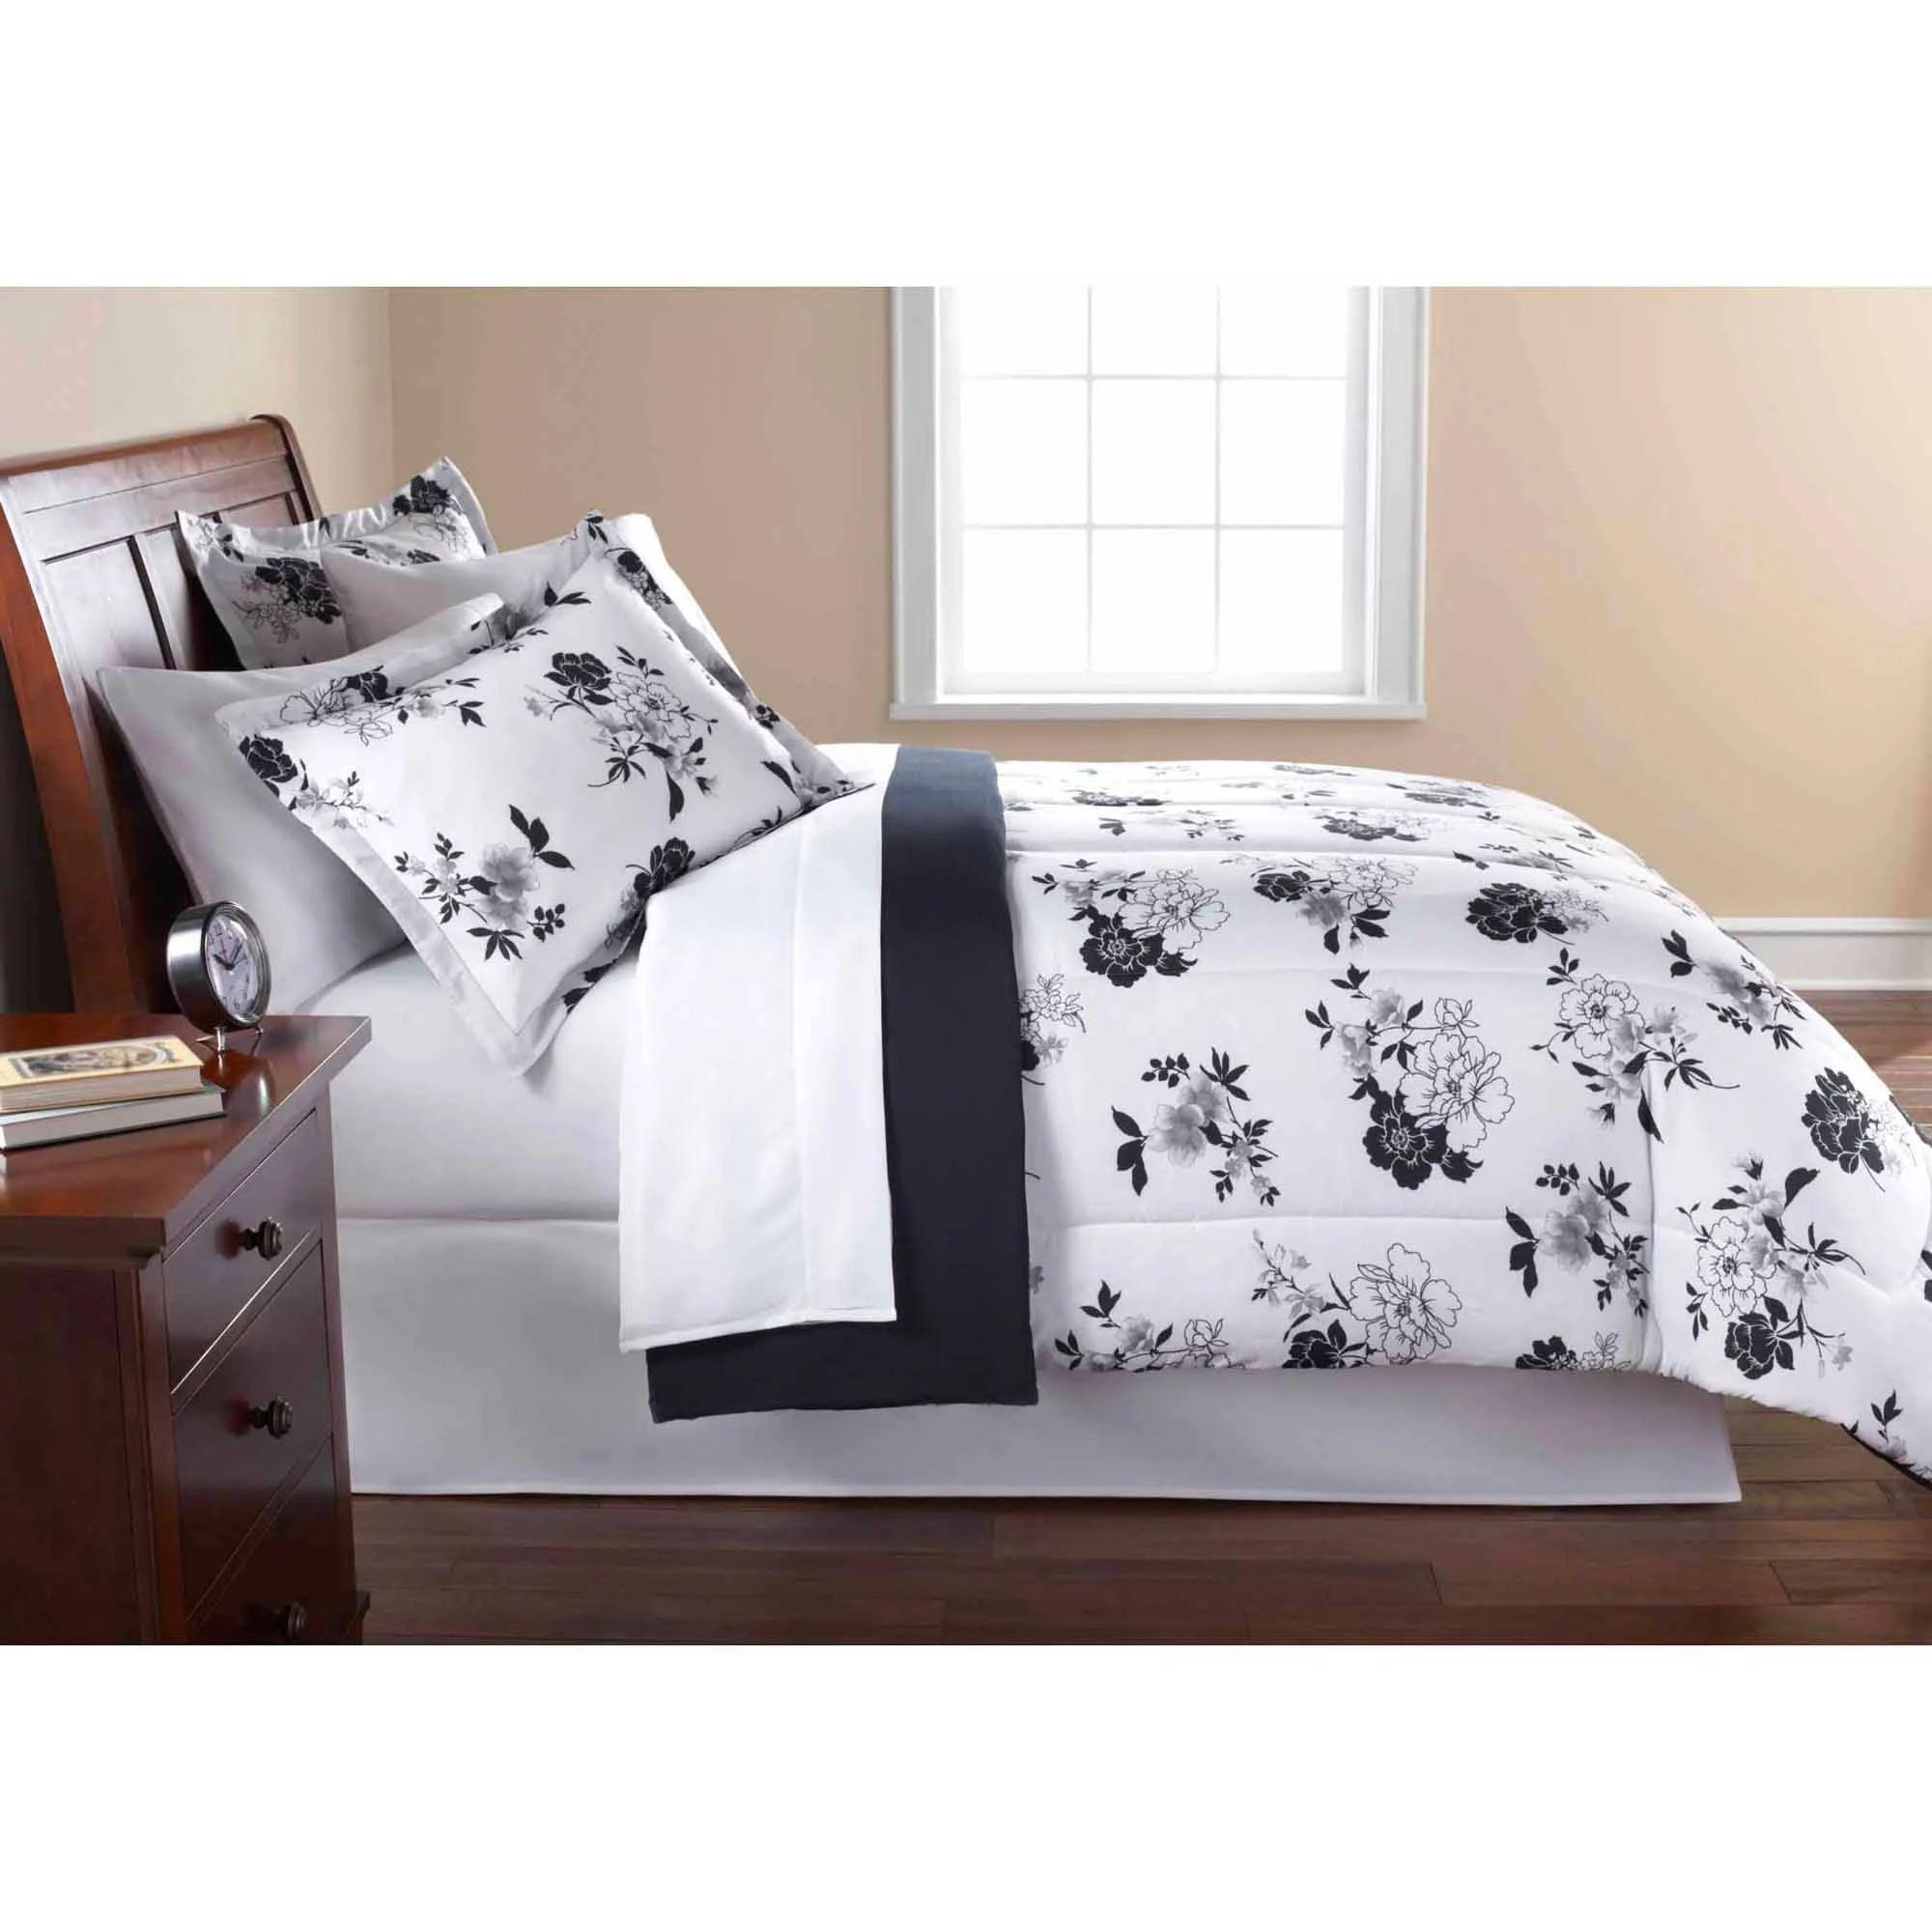 Mainstays black and white floral bed in a bag bedding comforter set walmart com